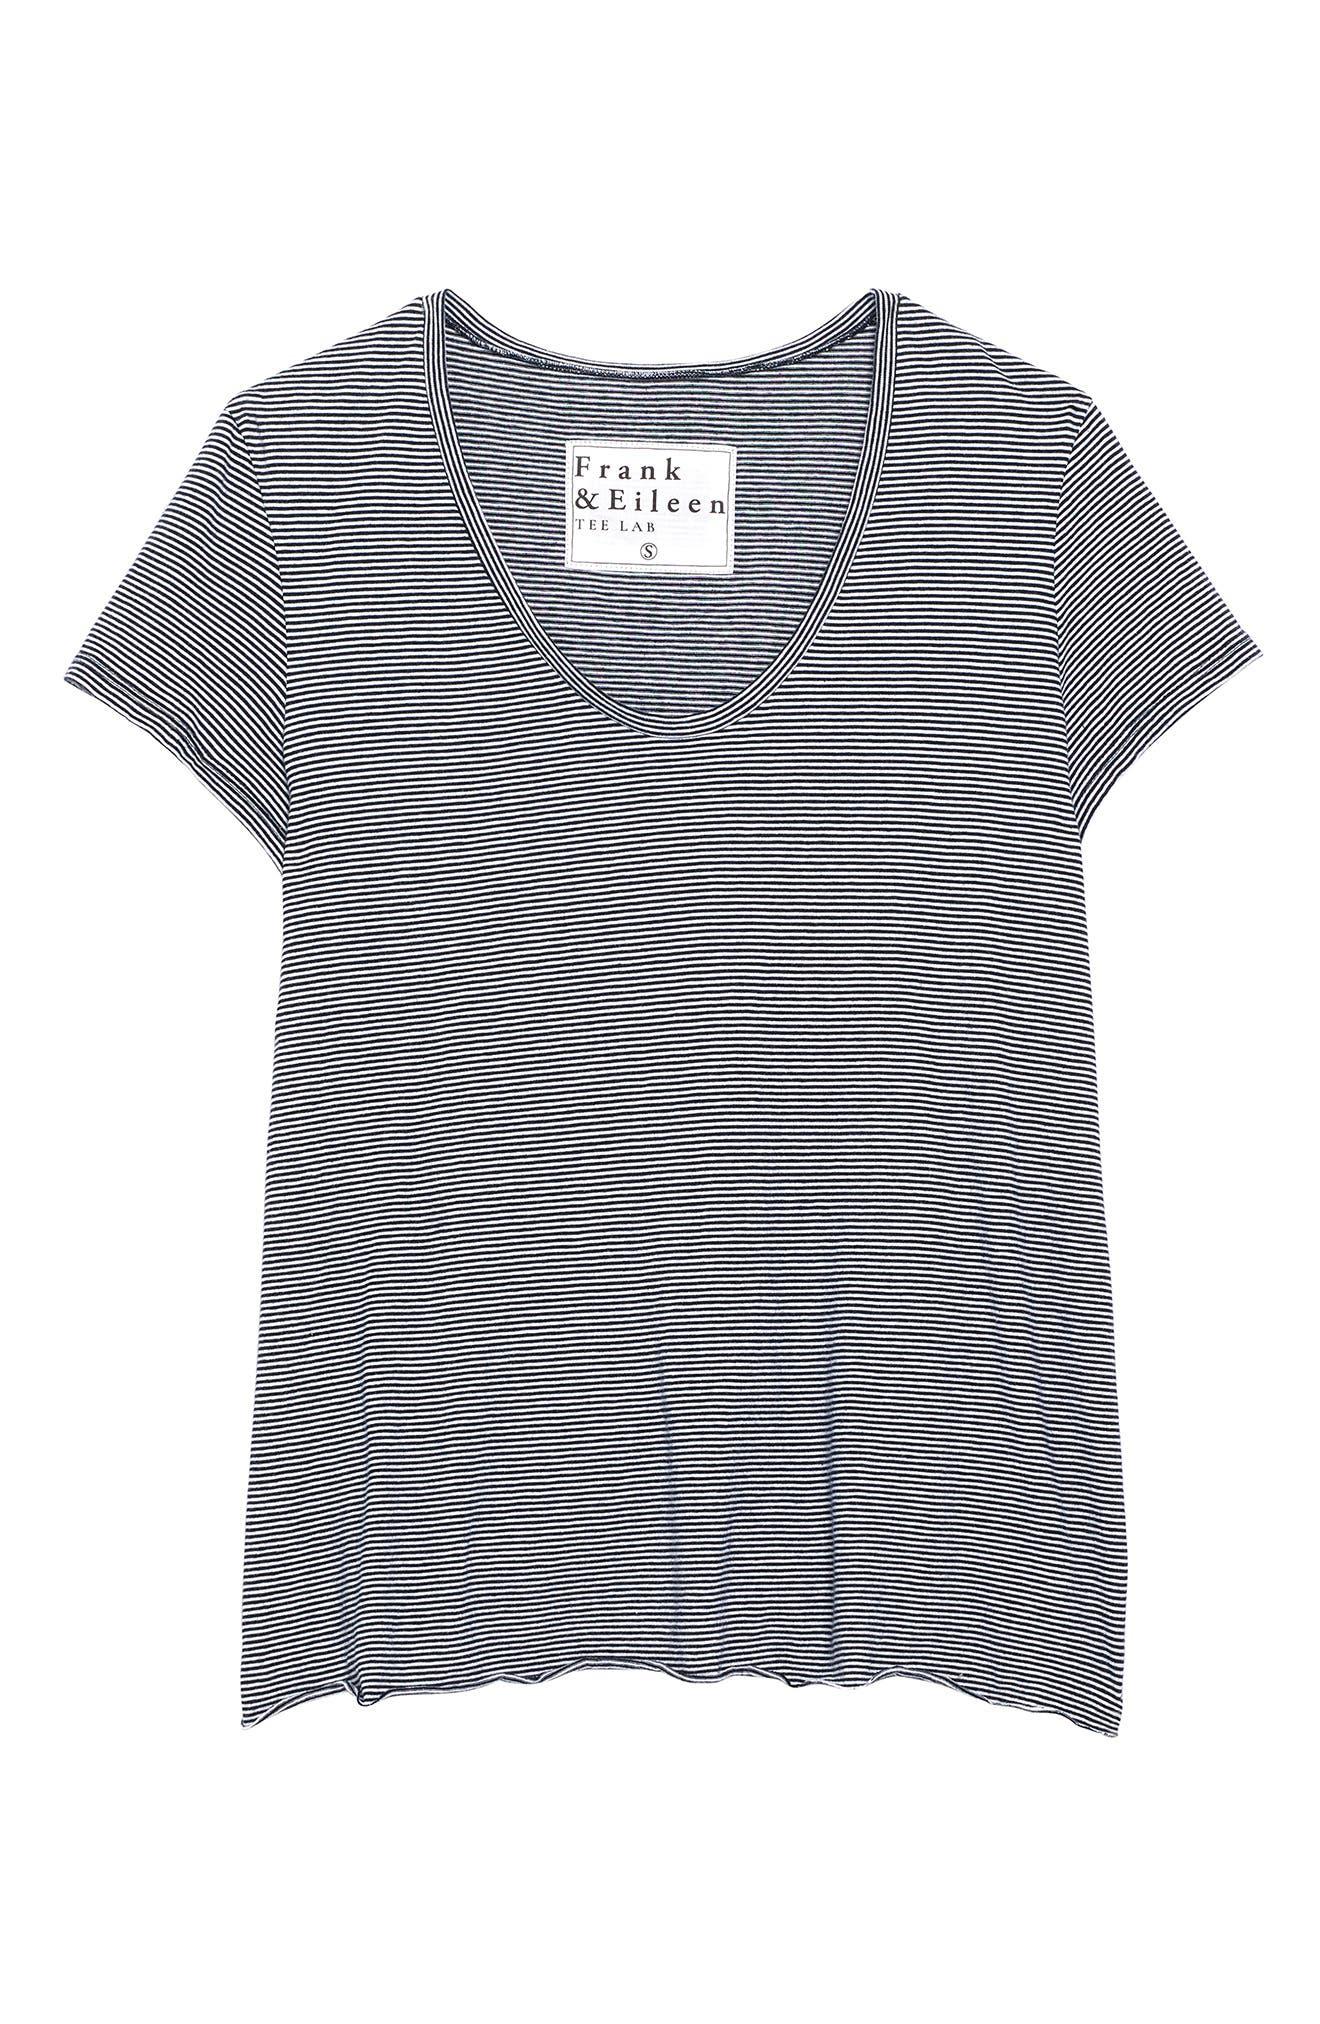 Image of FRANK & EILEEN Essential Scoop Neck T-Shirt